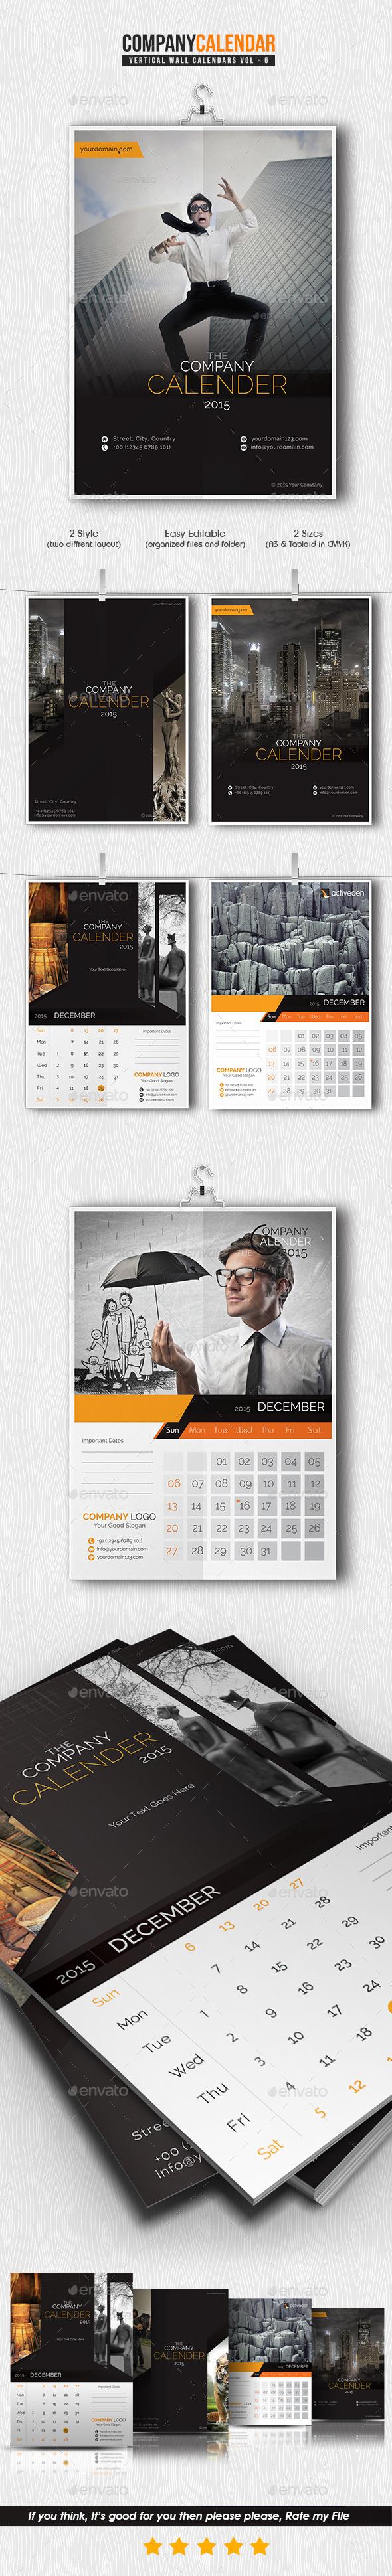 Company Calendar 2015